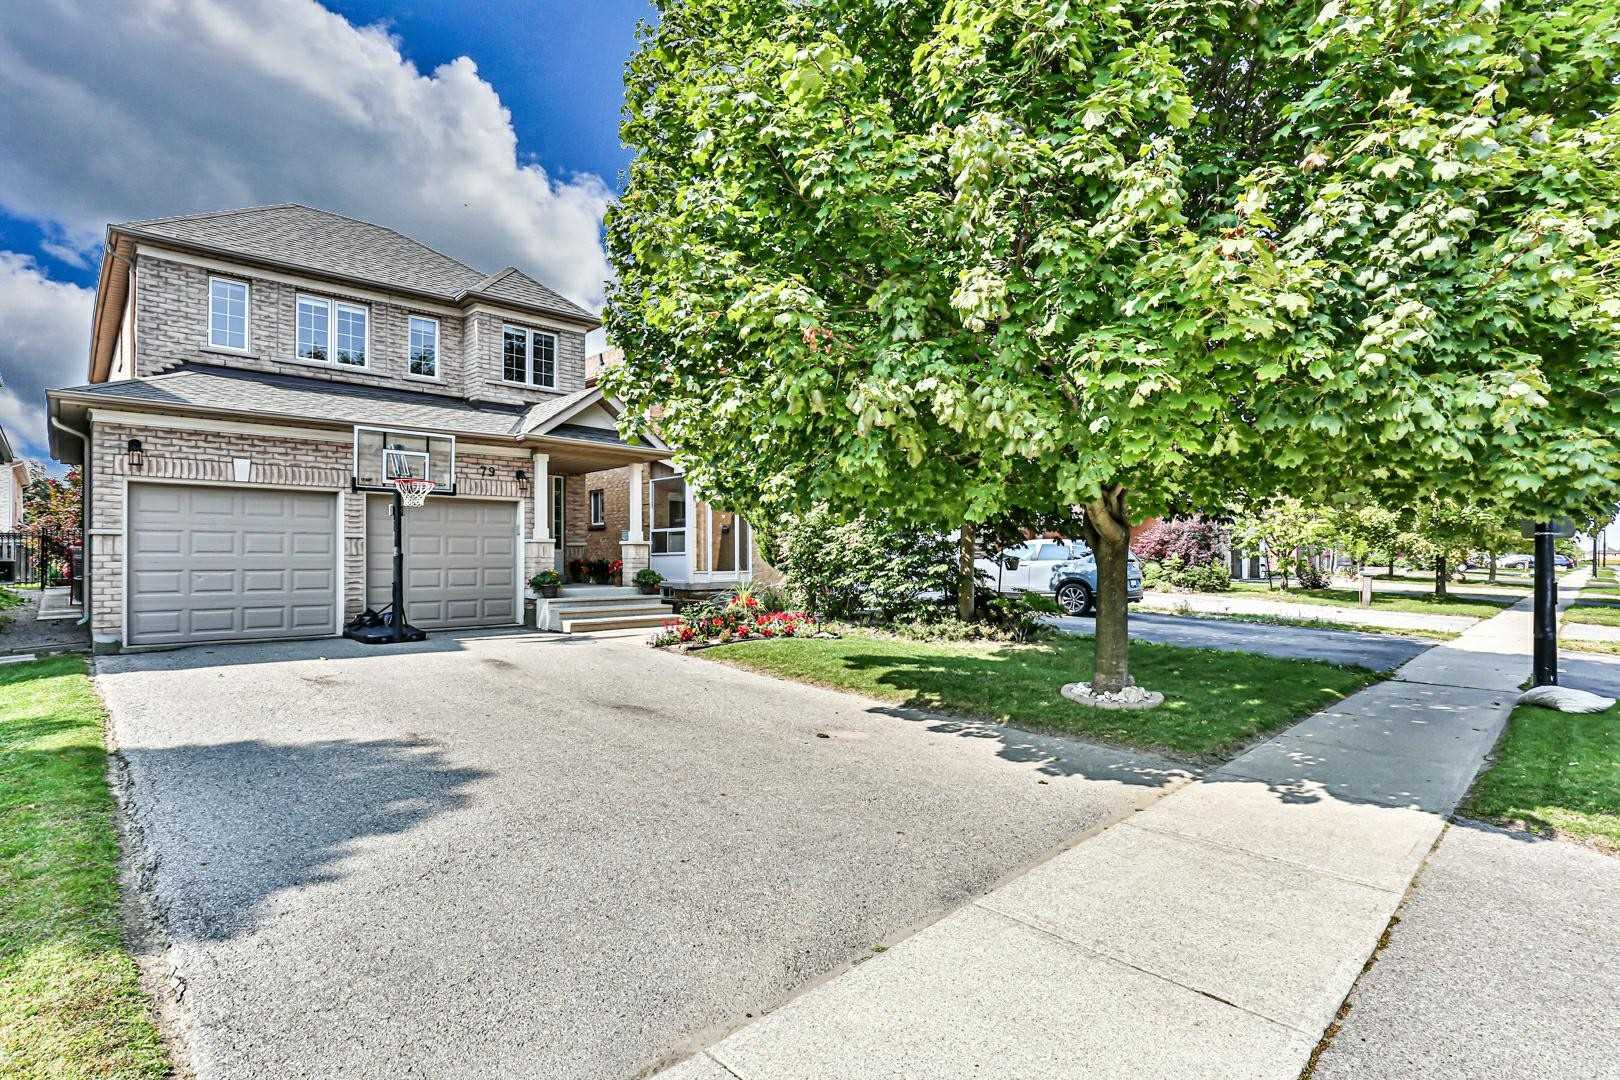 79 Jordanray Blvd, Newmarket, Ontario L3X2P8, 4 Bedrooms Bedrooms, 8 Rooms Rooms,4 BathroomsBathrooms,Detached,For Sale,Jordanray,N4924701